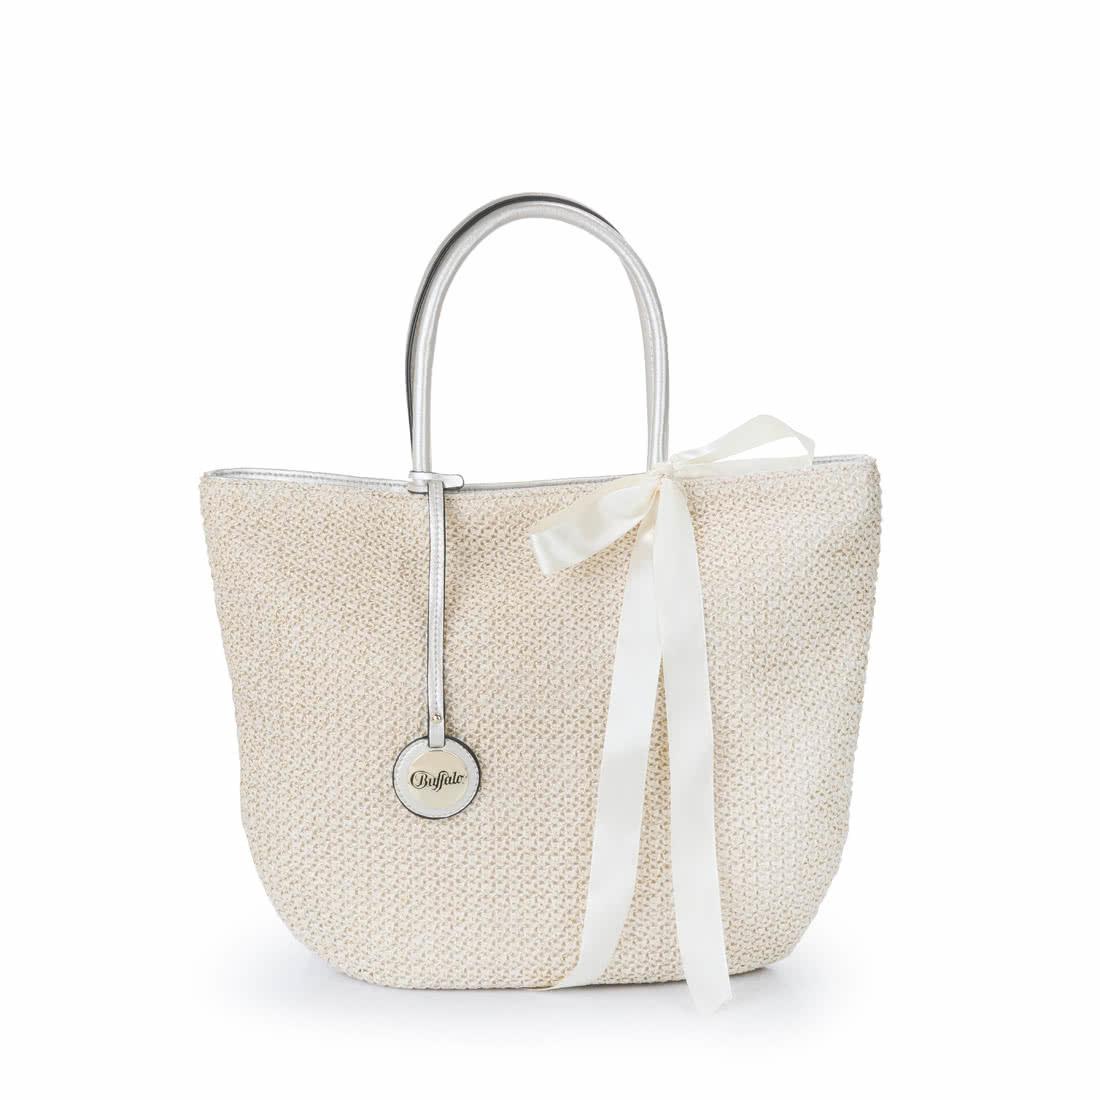 buffalo beach bag with bow buy online in buffalo online shop buffalo. Black Bedroom Furniture Sets. Home Design Ideas